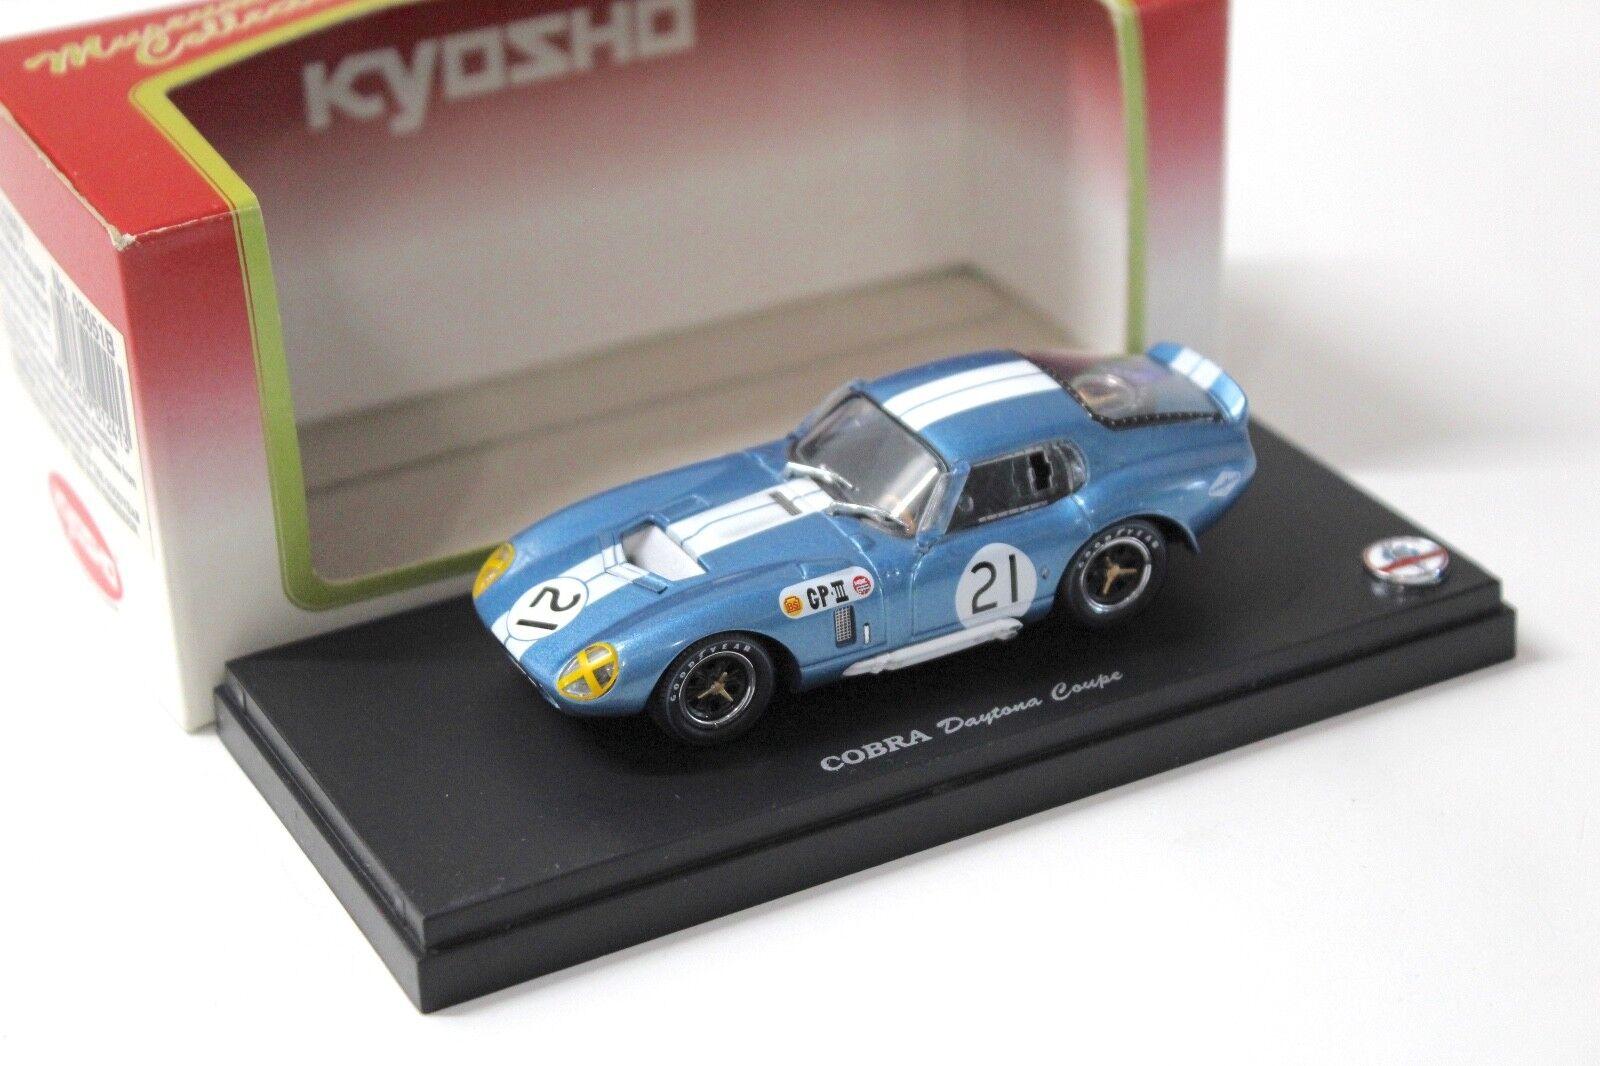 1 43 Kyosho Shelby Cobra Daytona Daytona Daytona coupé Japon GP  21 New chez Premium-modelcars 526708